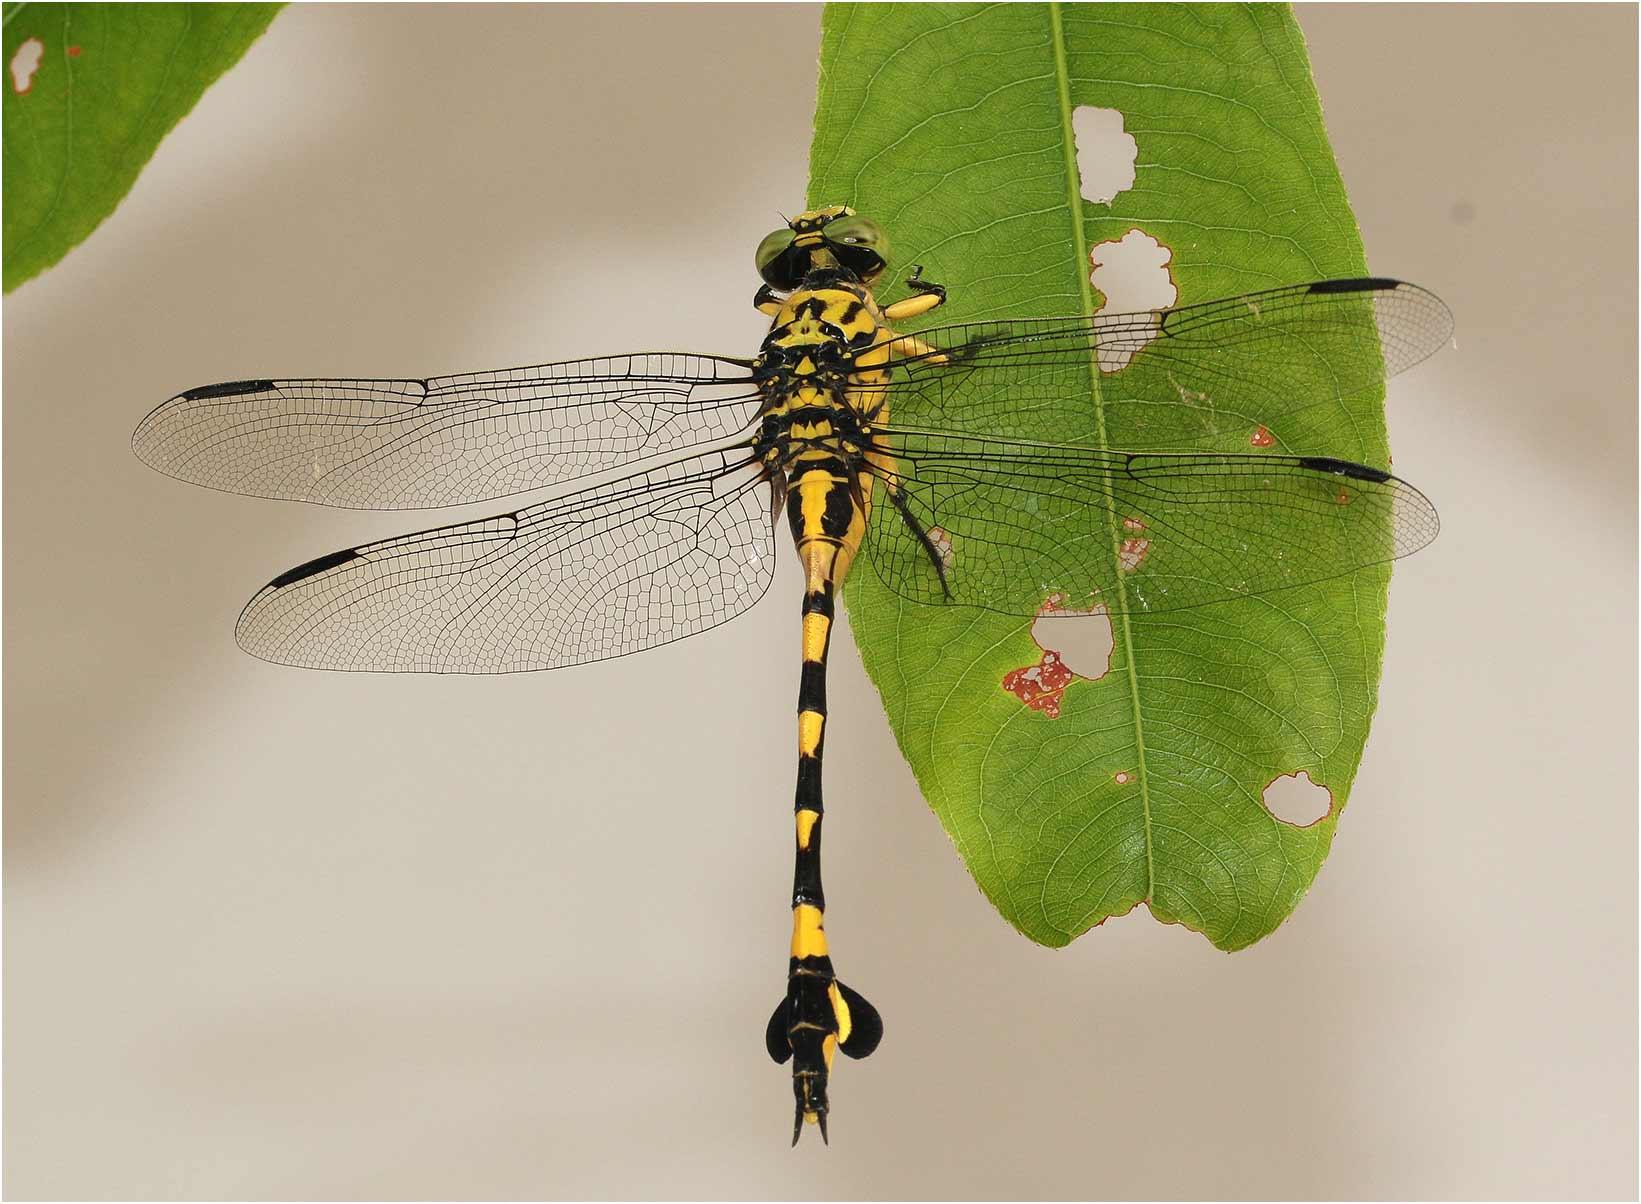 Sinictogomphus clavatus femelle, Vietnam, Cuc Phong, 14/06/18